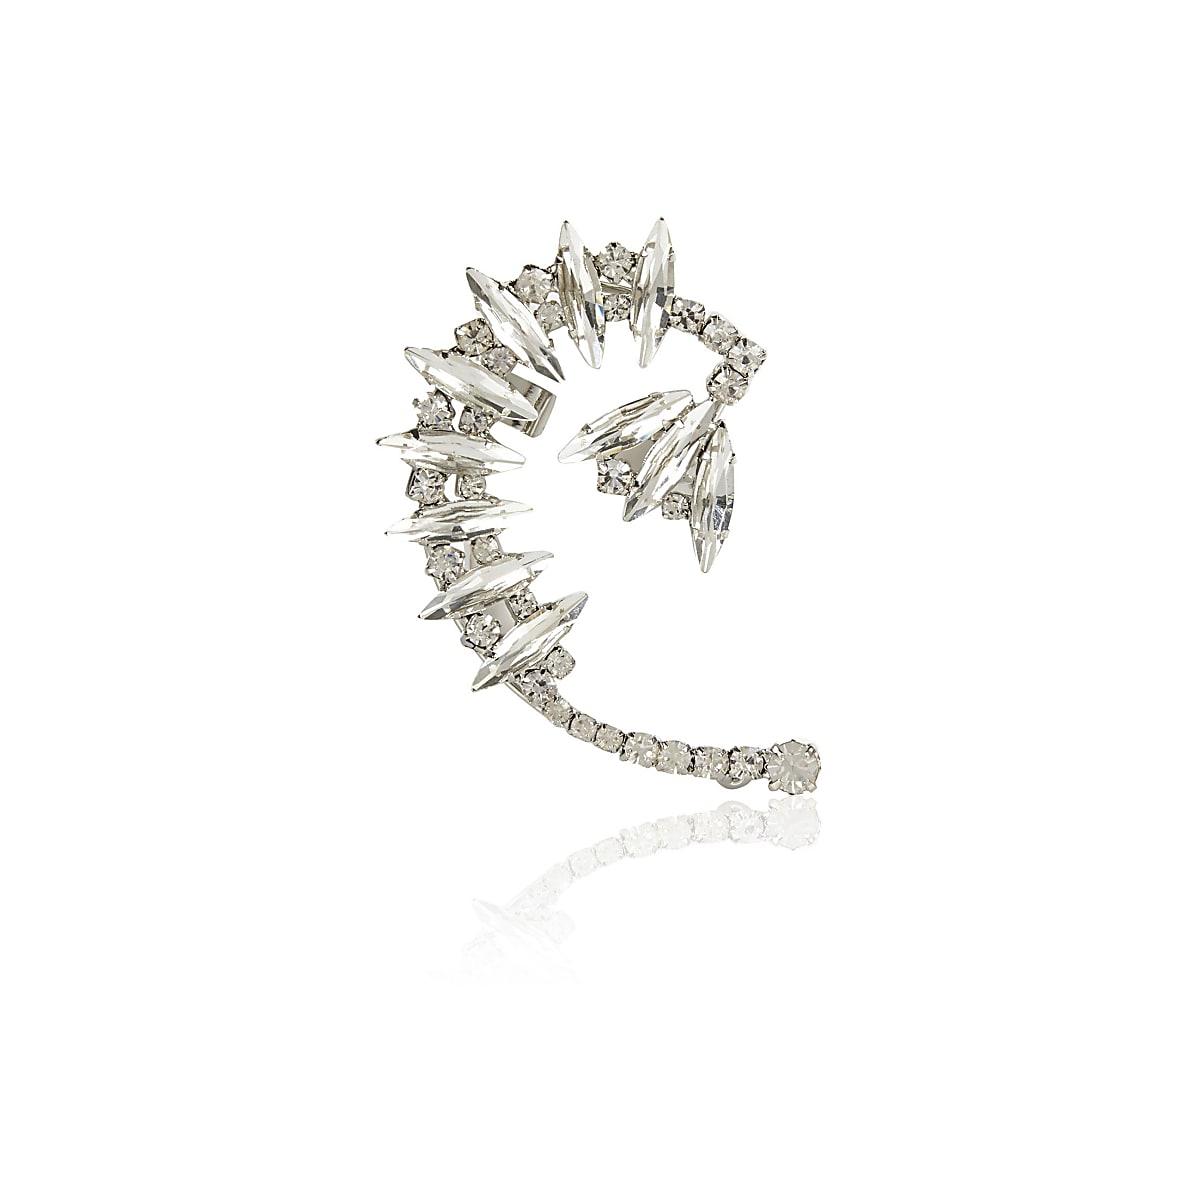 Silver tone embellished statement ear cuff